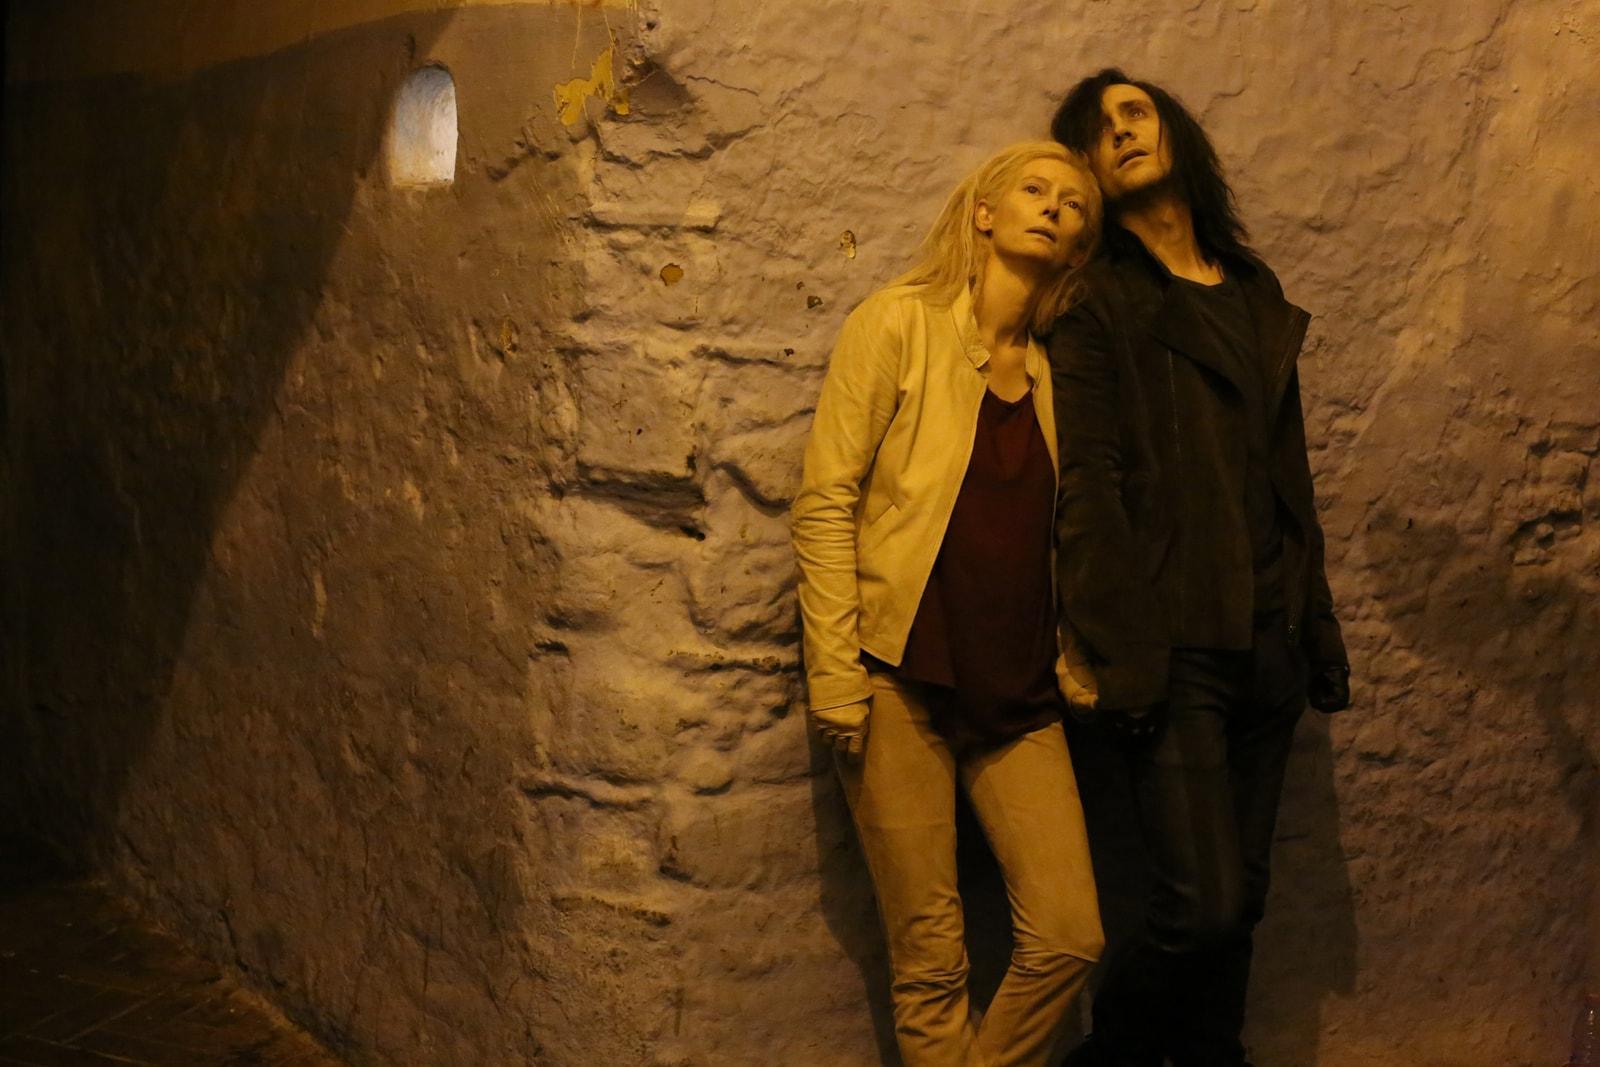 淺談 WACKO MARIA x Jim Jarmusch 聯名系列致敬之作《Only Lovers Left Alive》